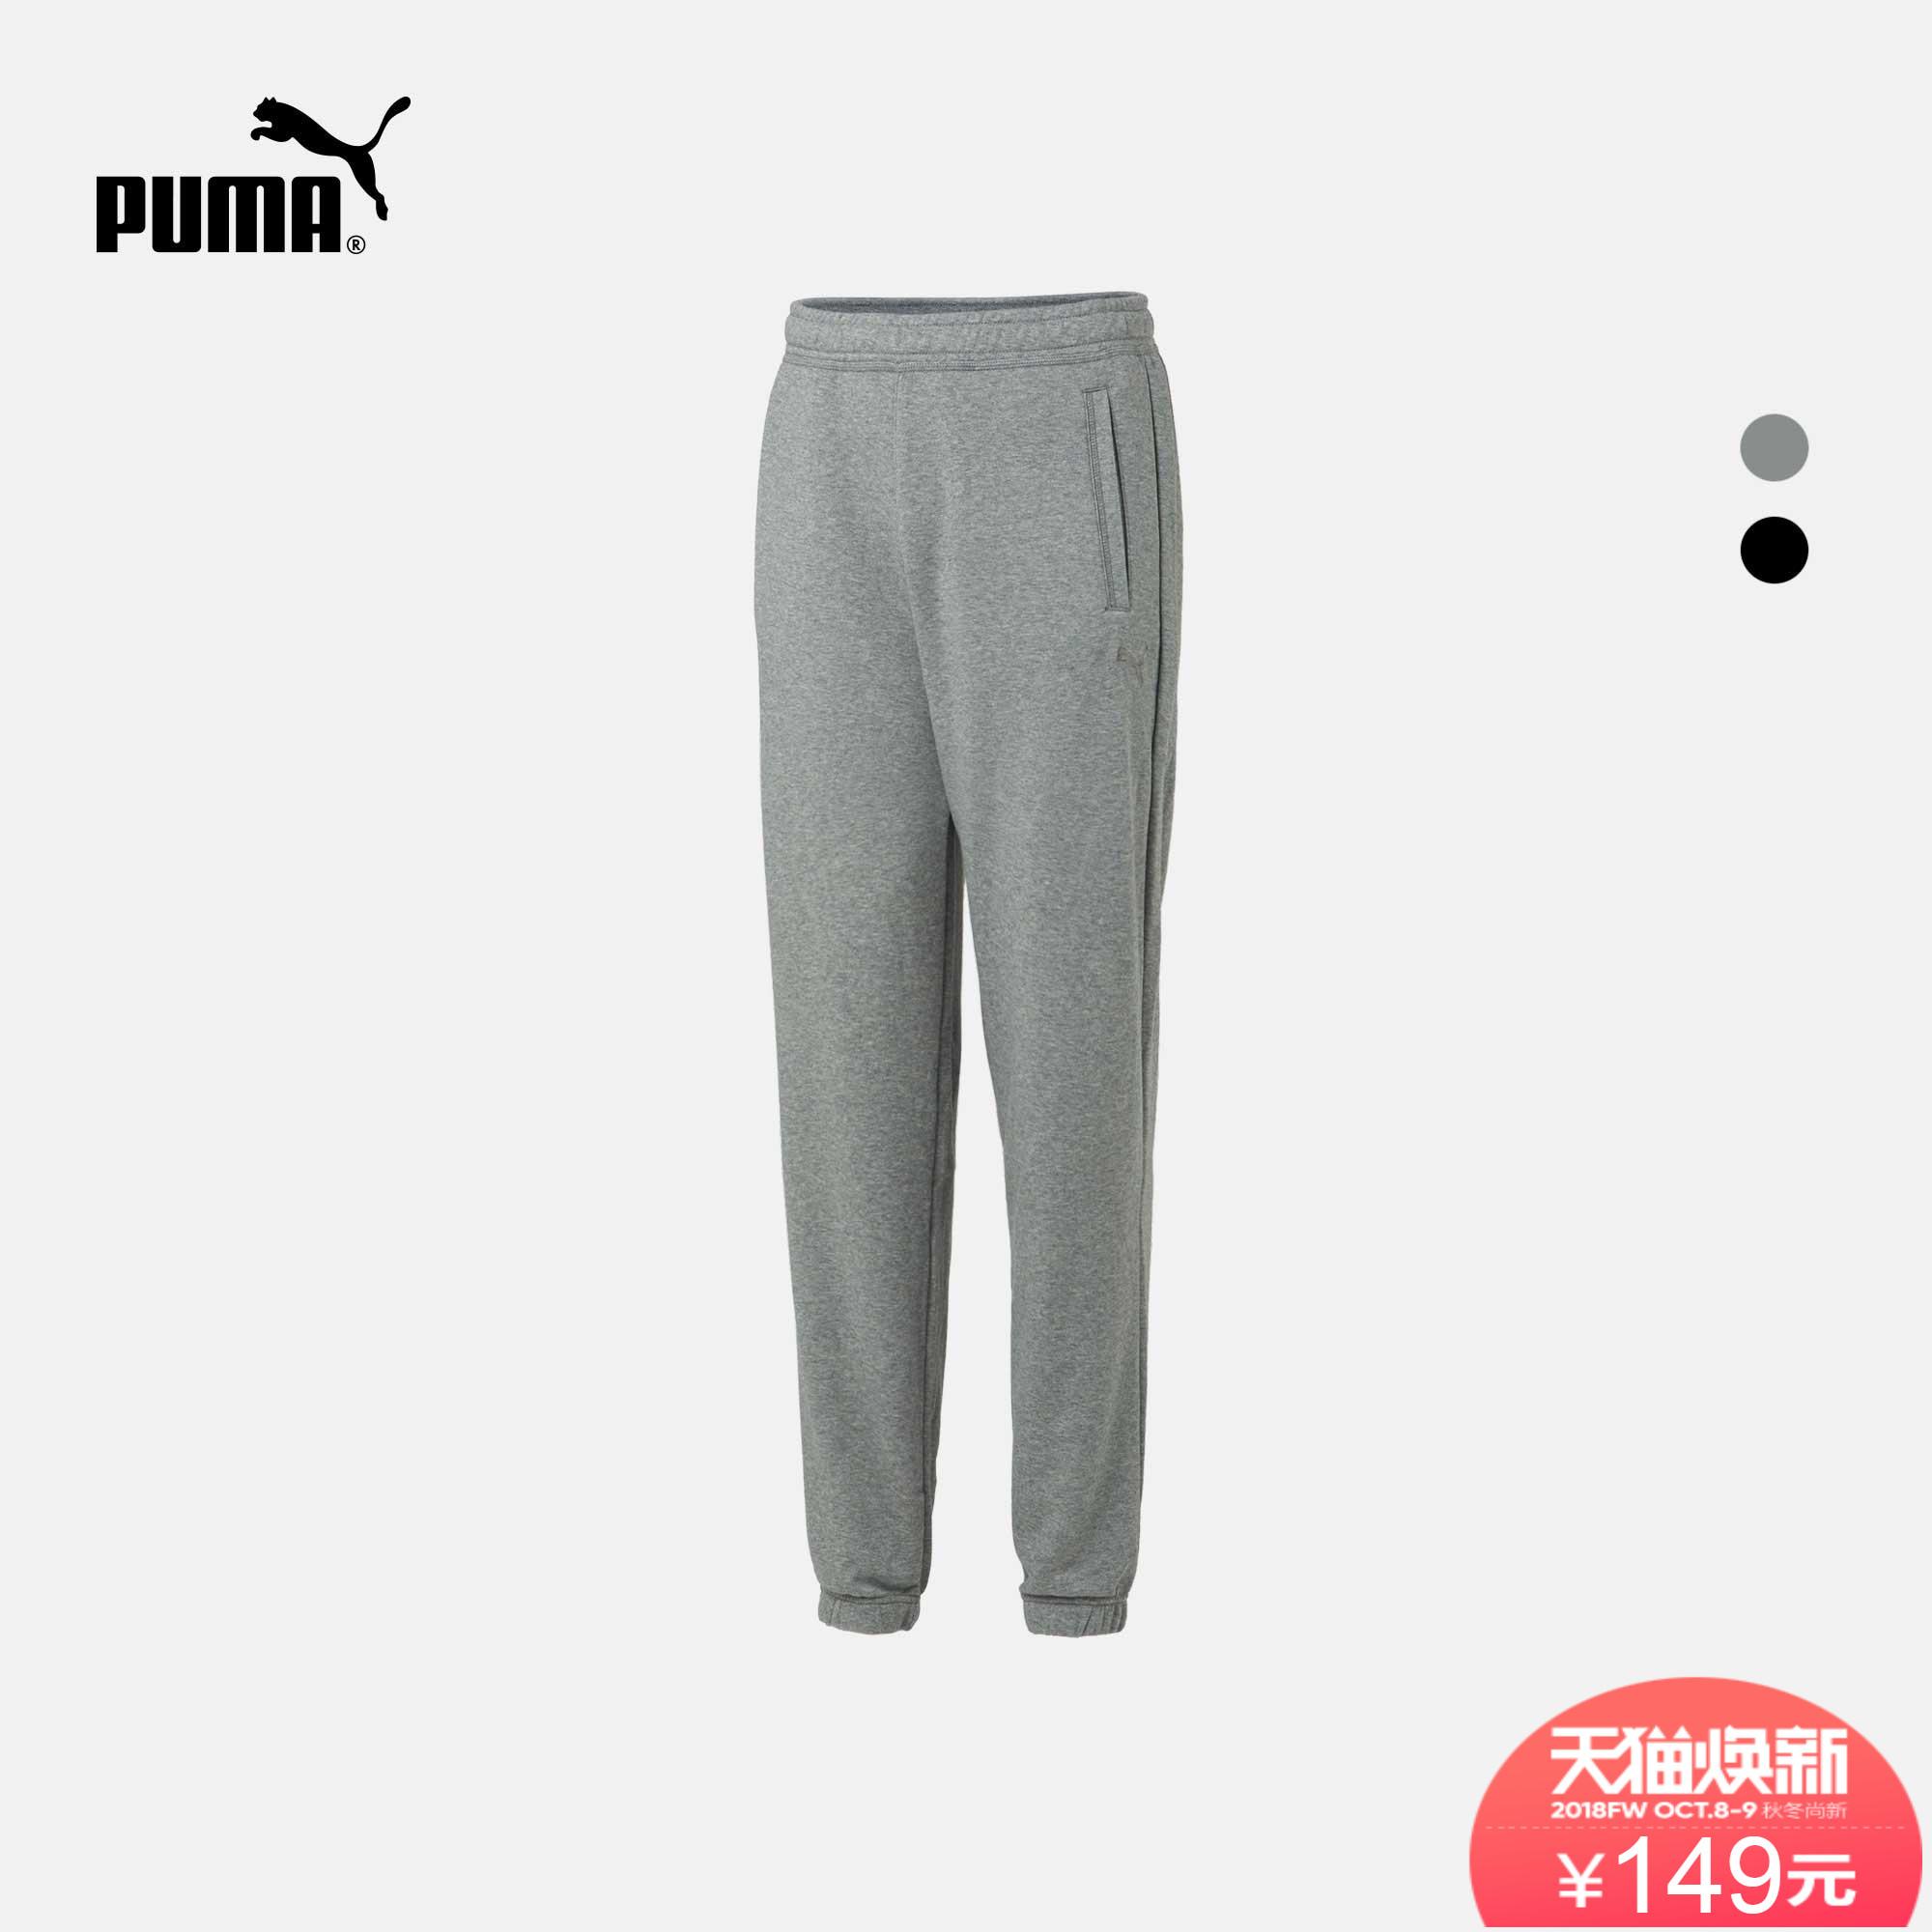 PUMA彪马官方 男子针织长裤 CN 817800